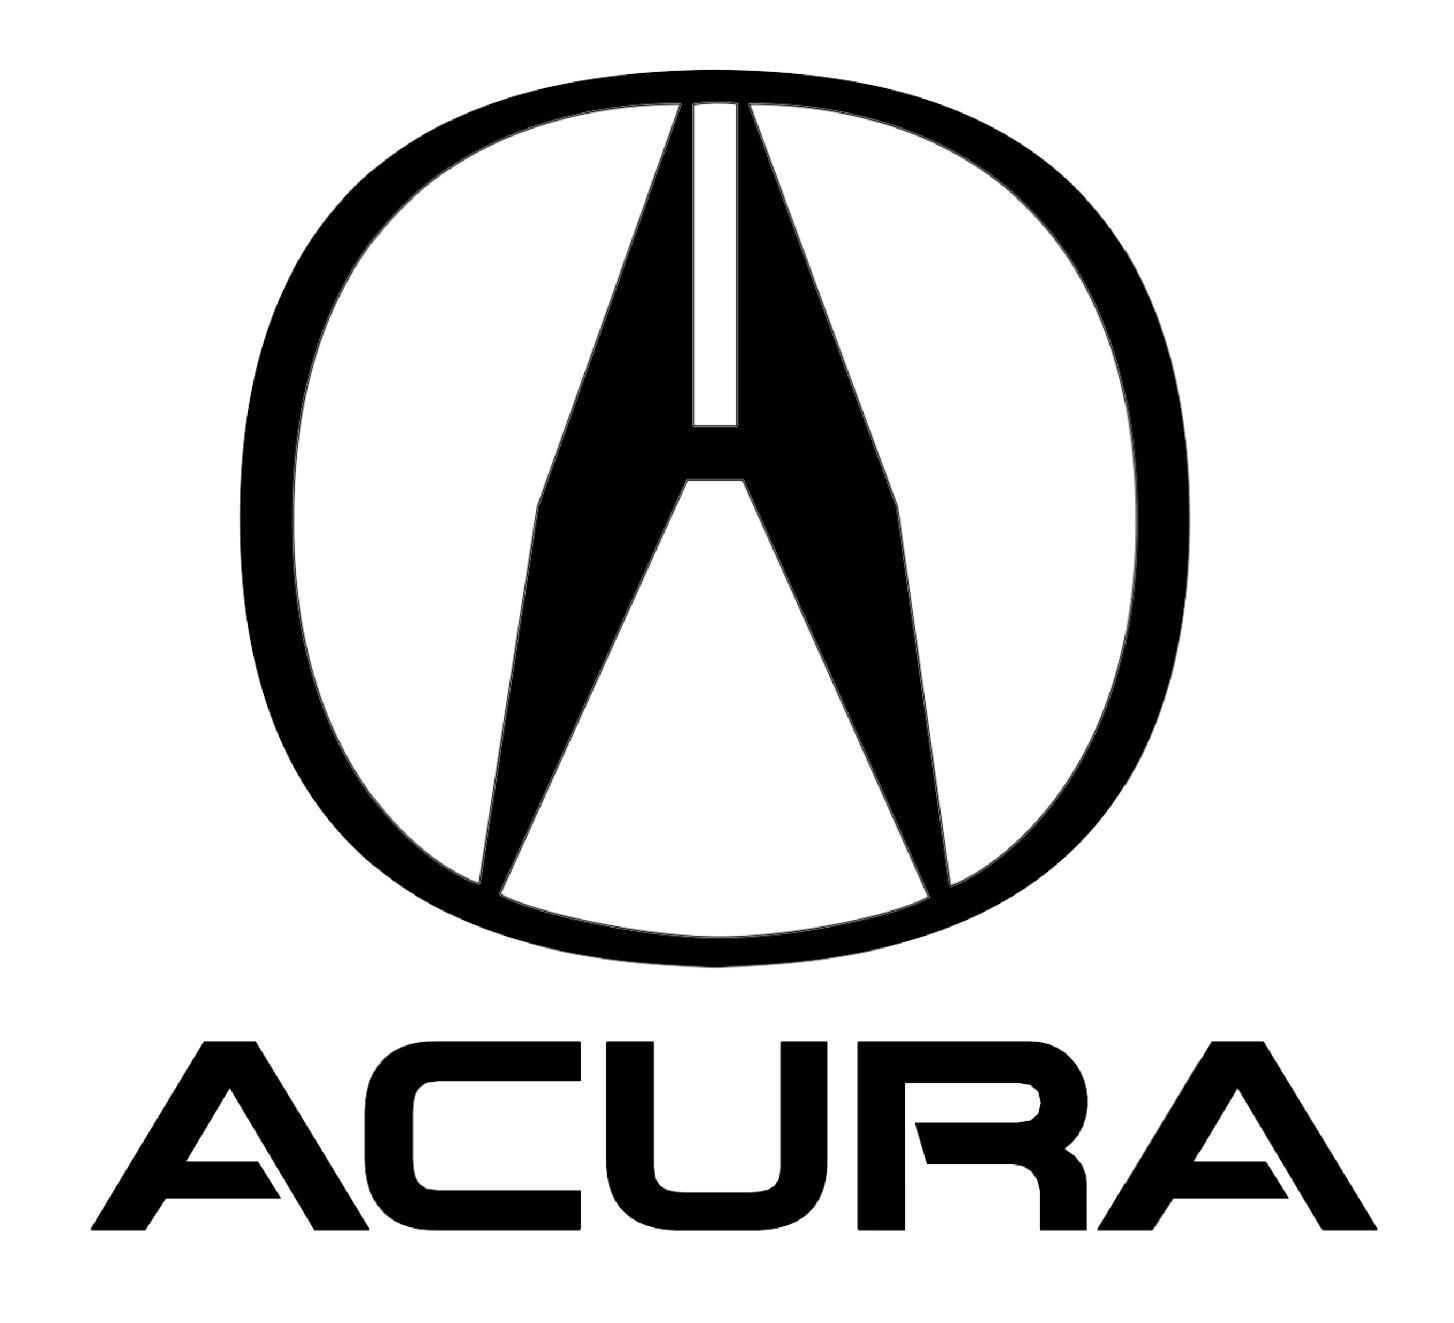 Acura Thumb